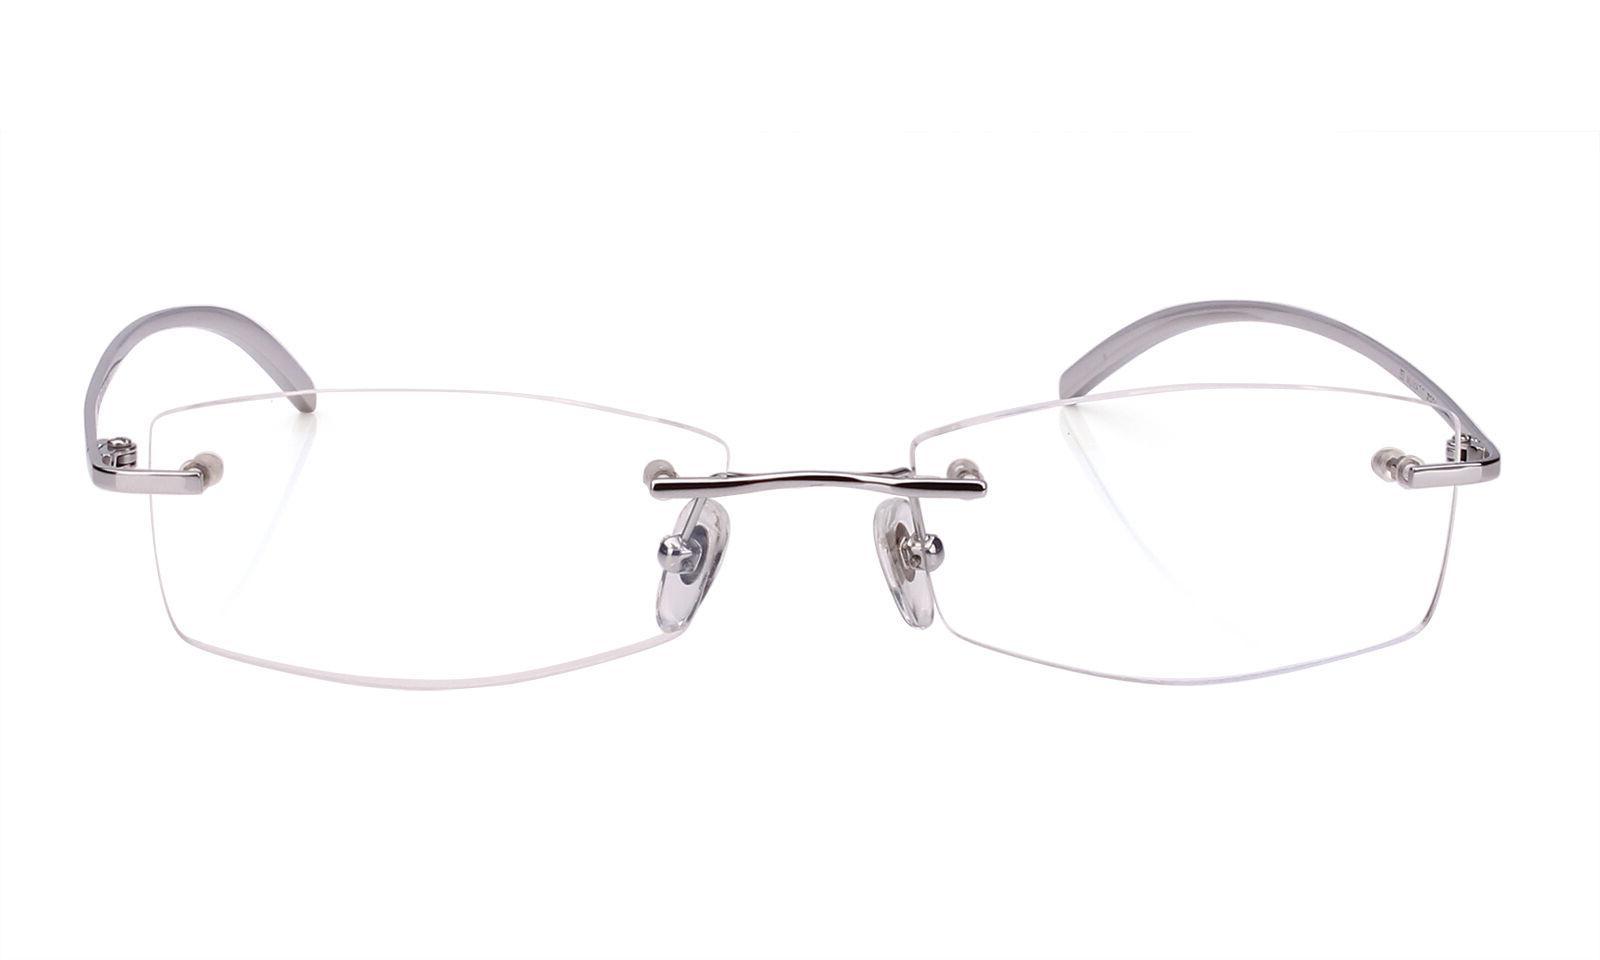 Agstum Rimless Frame Titanium Classic Prescription Eyeglasses Rx Clear